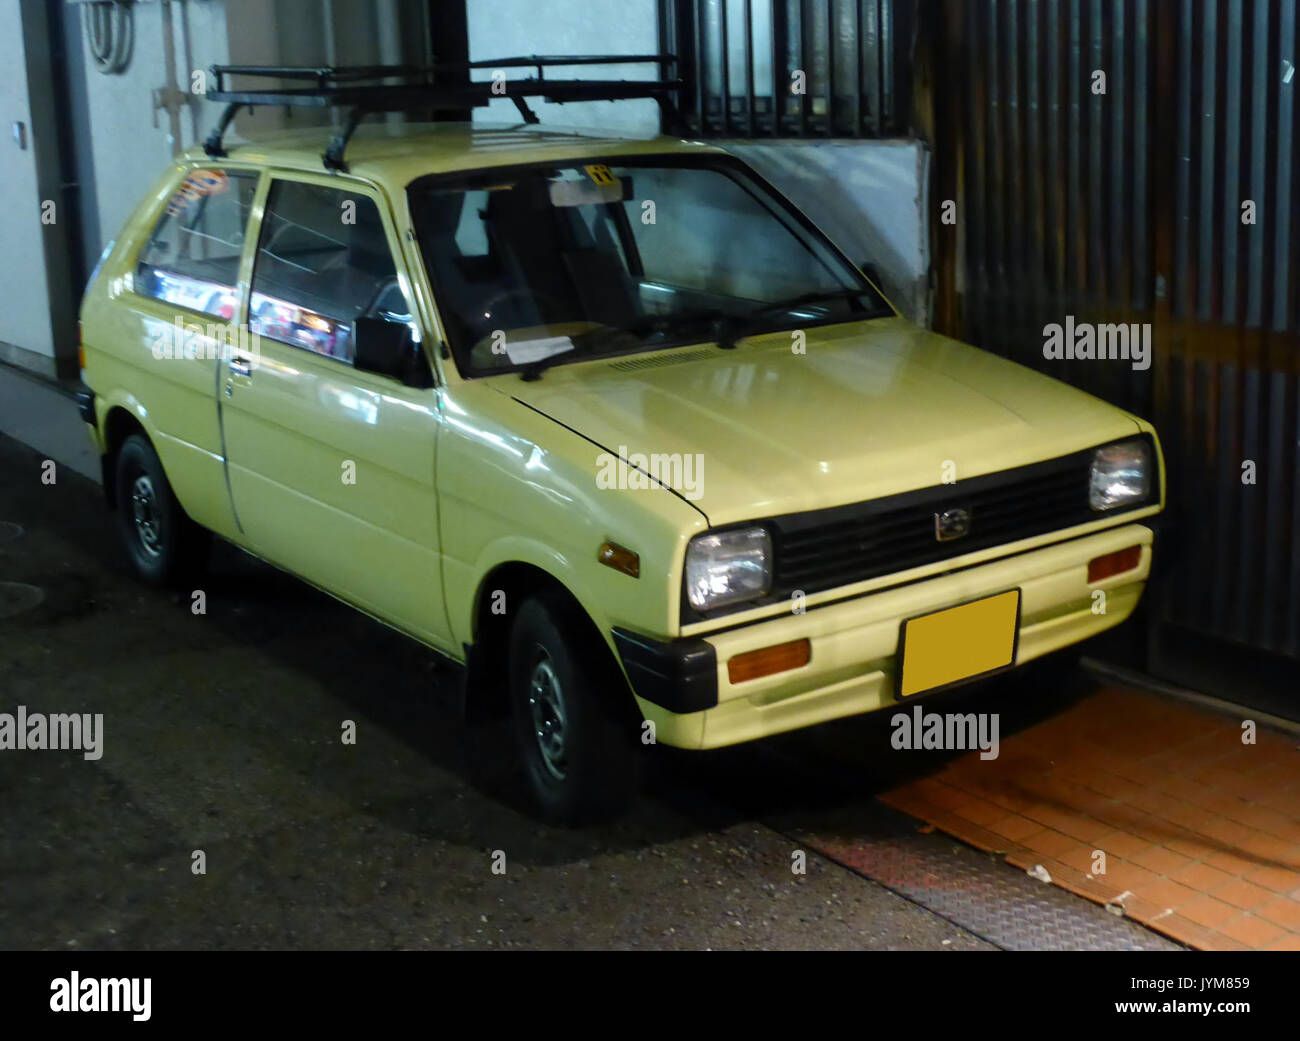 2nd Generation Subaru Rex U At Night Front Stock Photo 154724117